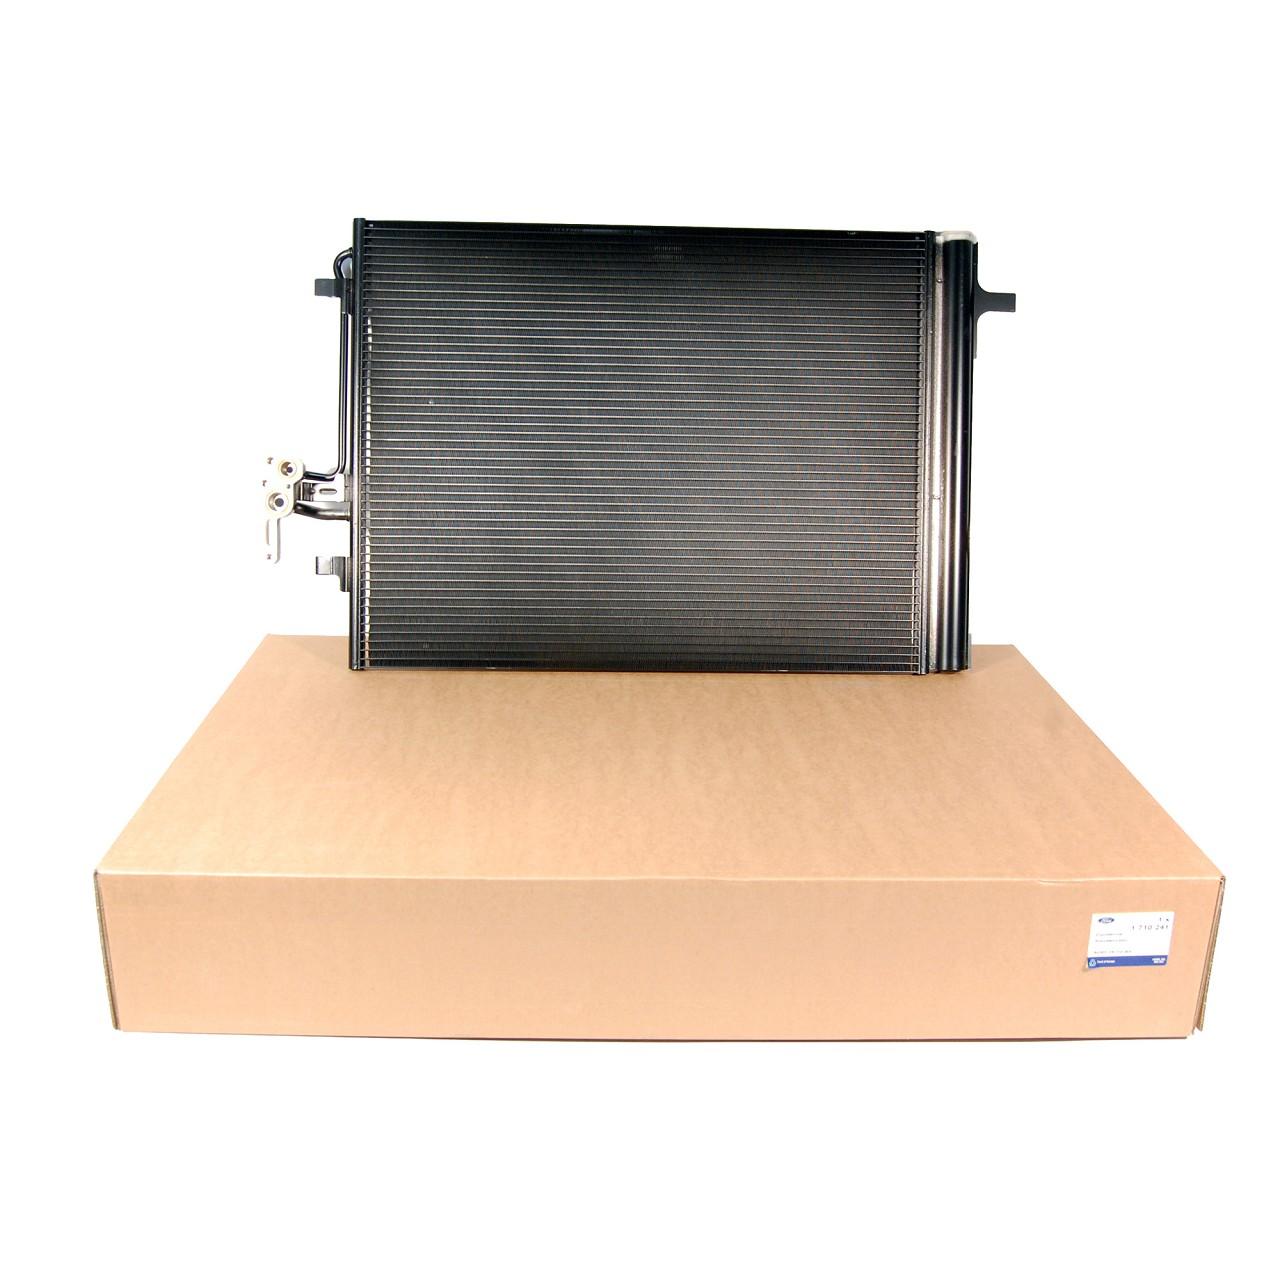 ORIGINAL Ford Kondensator Klimakondensator Klimakühler Galaxy Mondeo IV 1710241